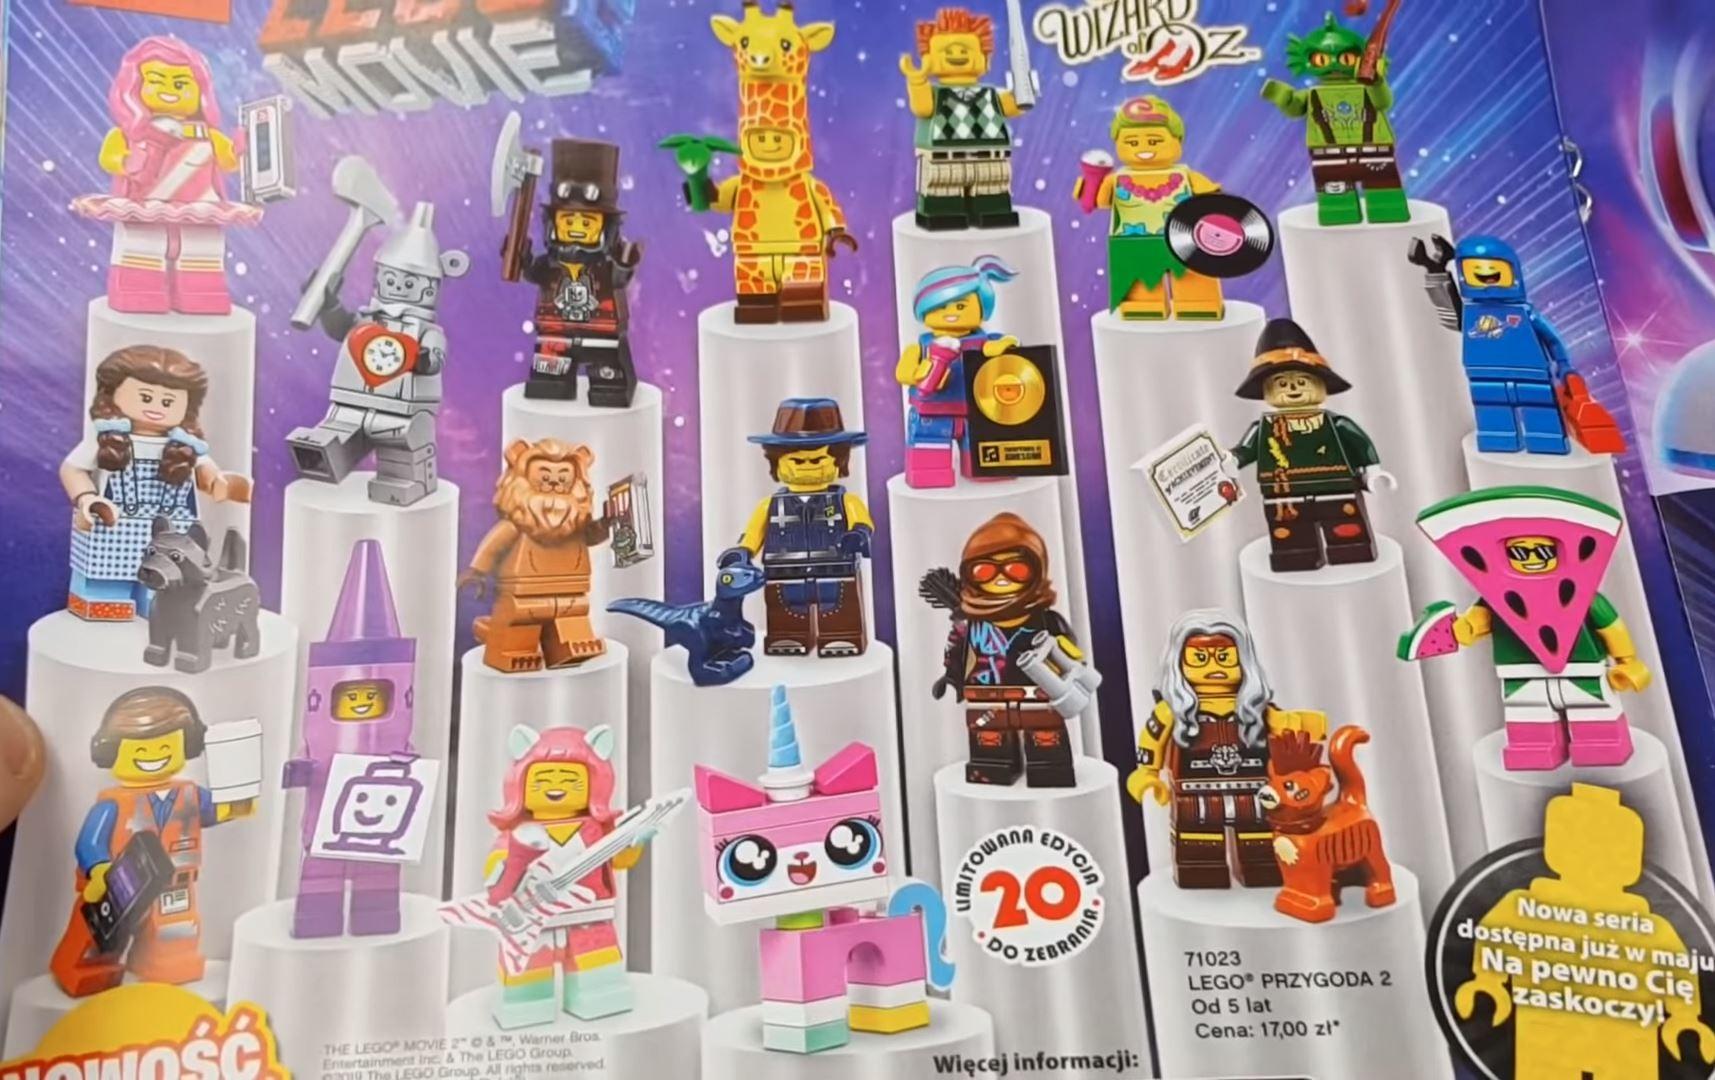 71023 Minifigures The Lego Movie 2 Page 3 Minifigures Brickpicker